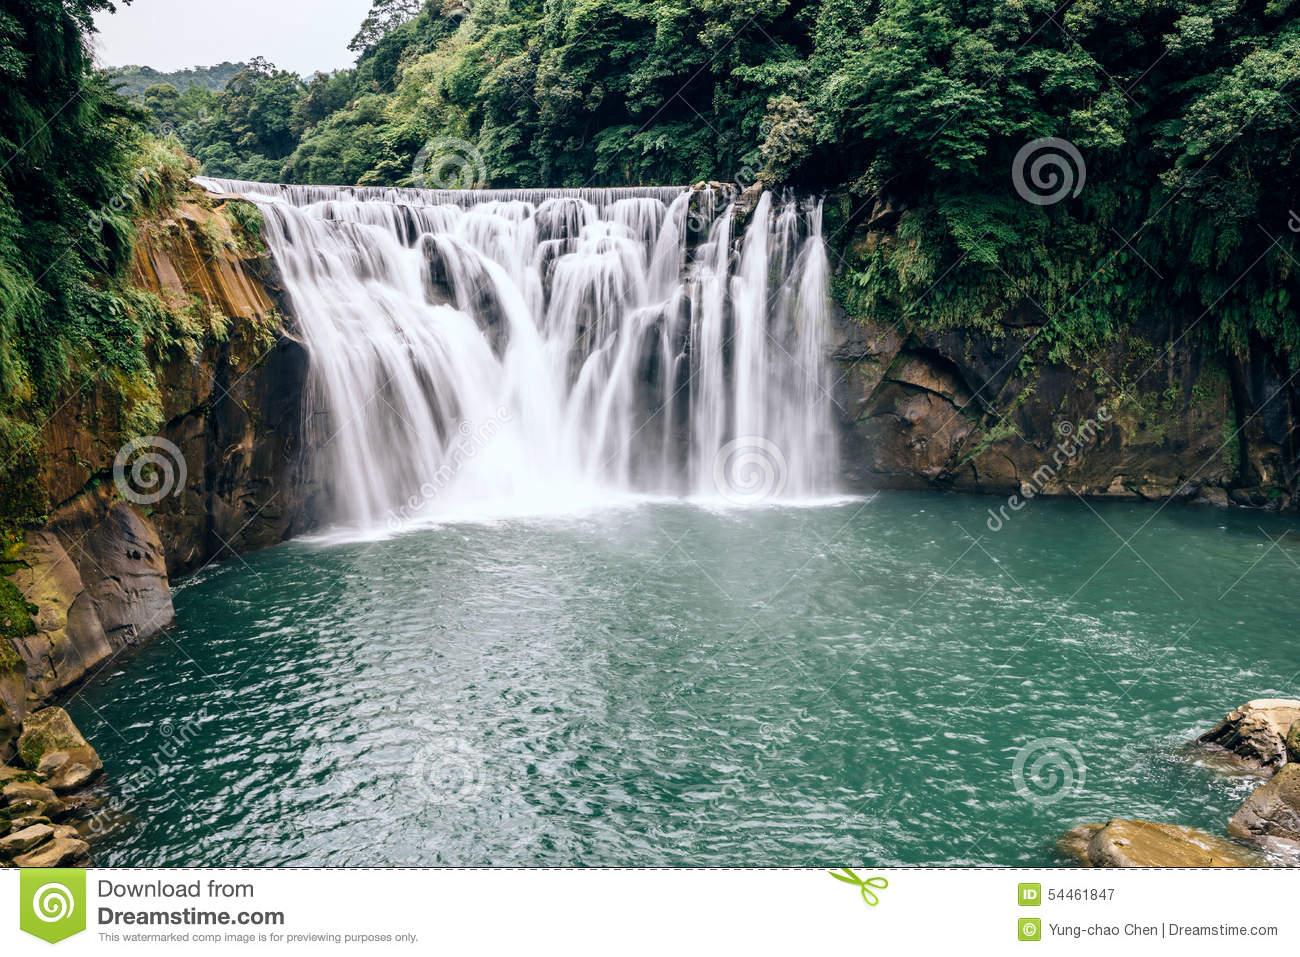 Shifen Waterfall clipart #13, Download drawings